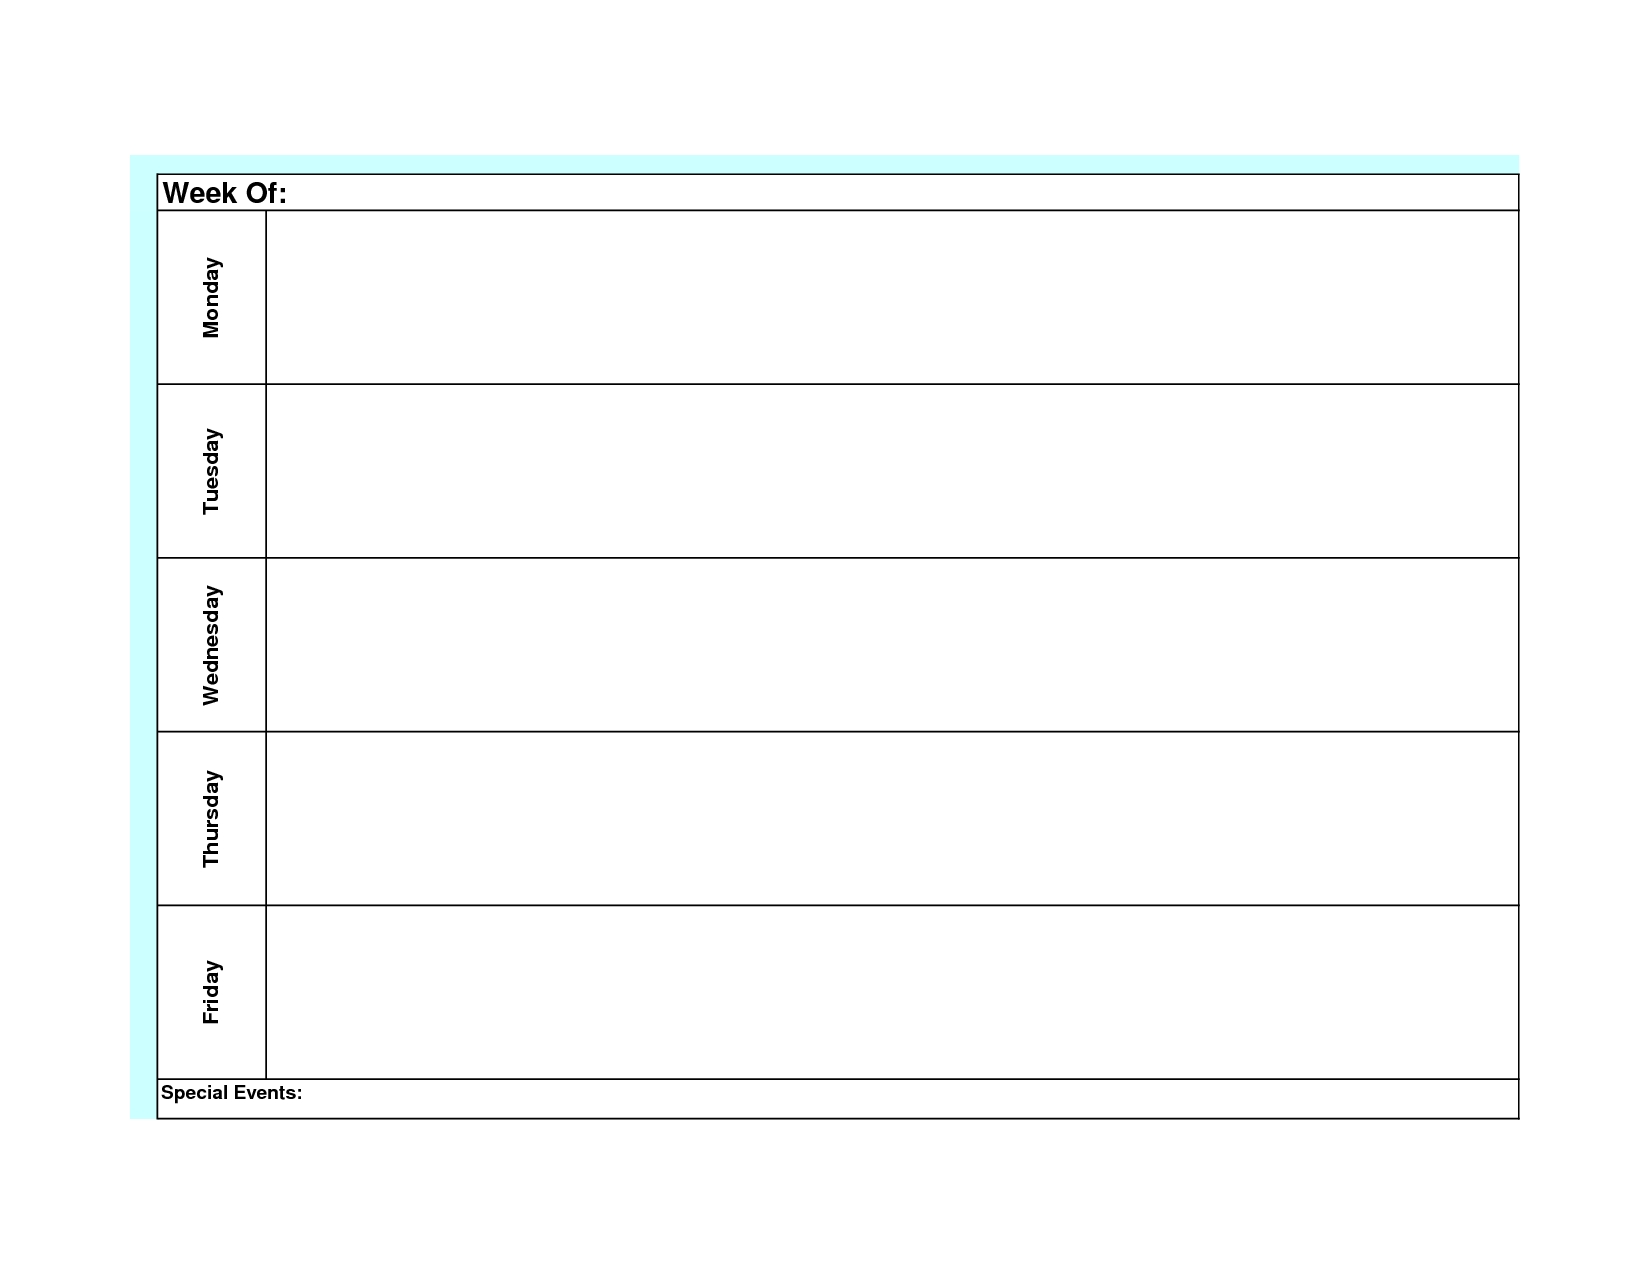 Blank Weekly Calendar Monday Through Friday Template Planner To | Smorad inside Monday Through Friday Blank Calendar Template